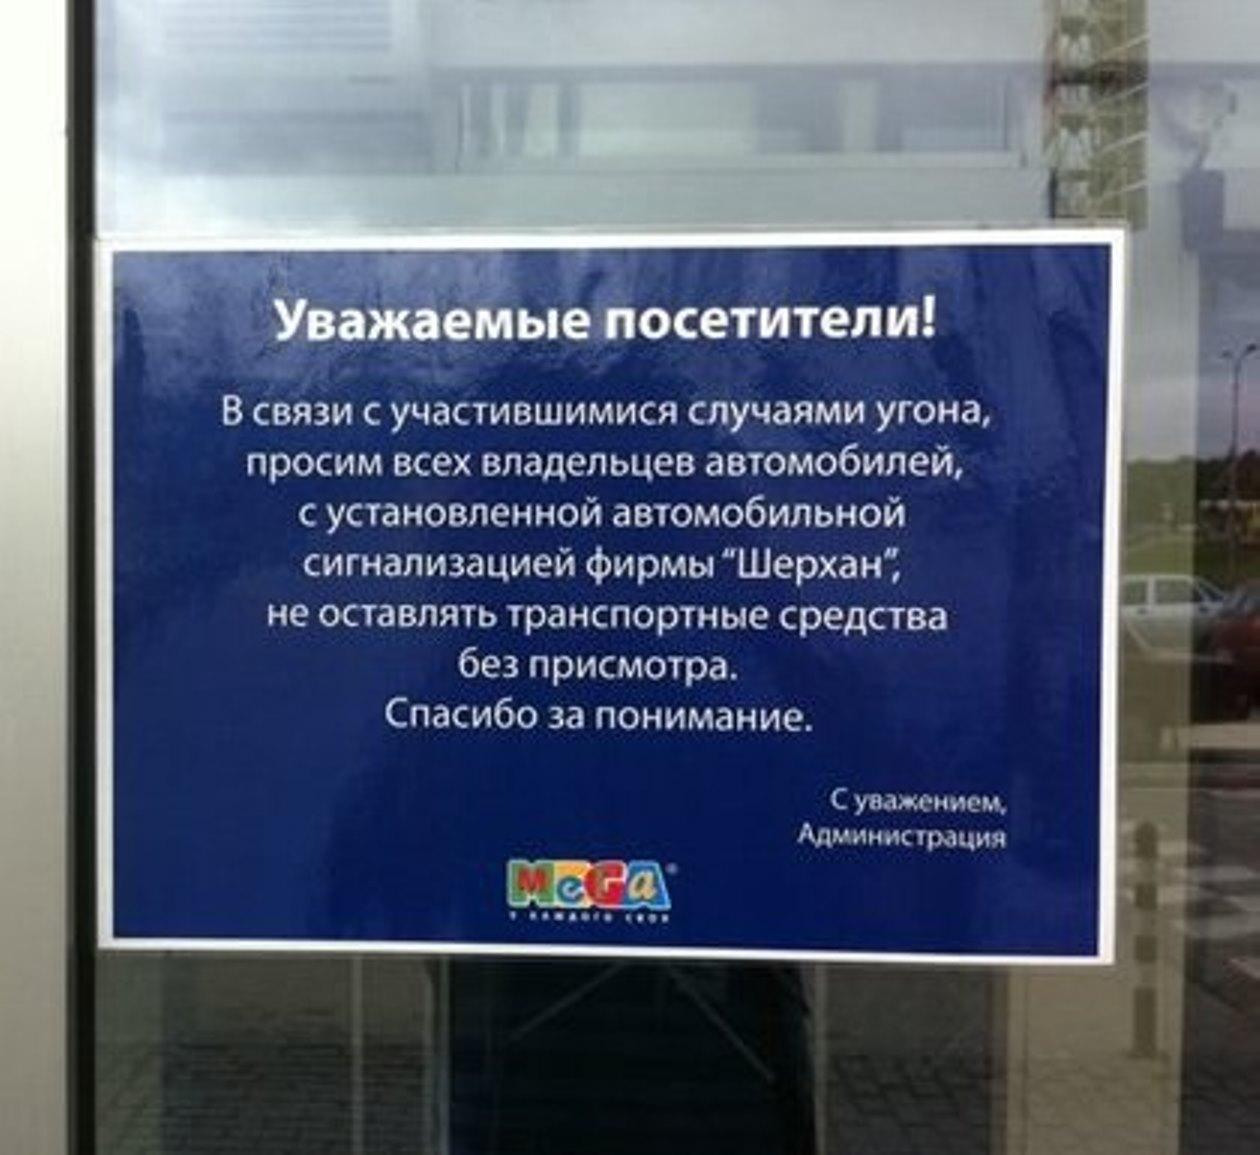 http://cstor.nn2.ru/userfiles/data/ufiles/2016-05/8a/11/4f/573c449917560_mega.jpg